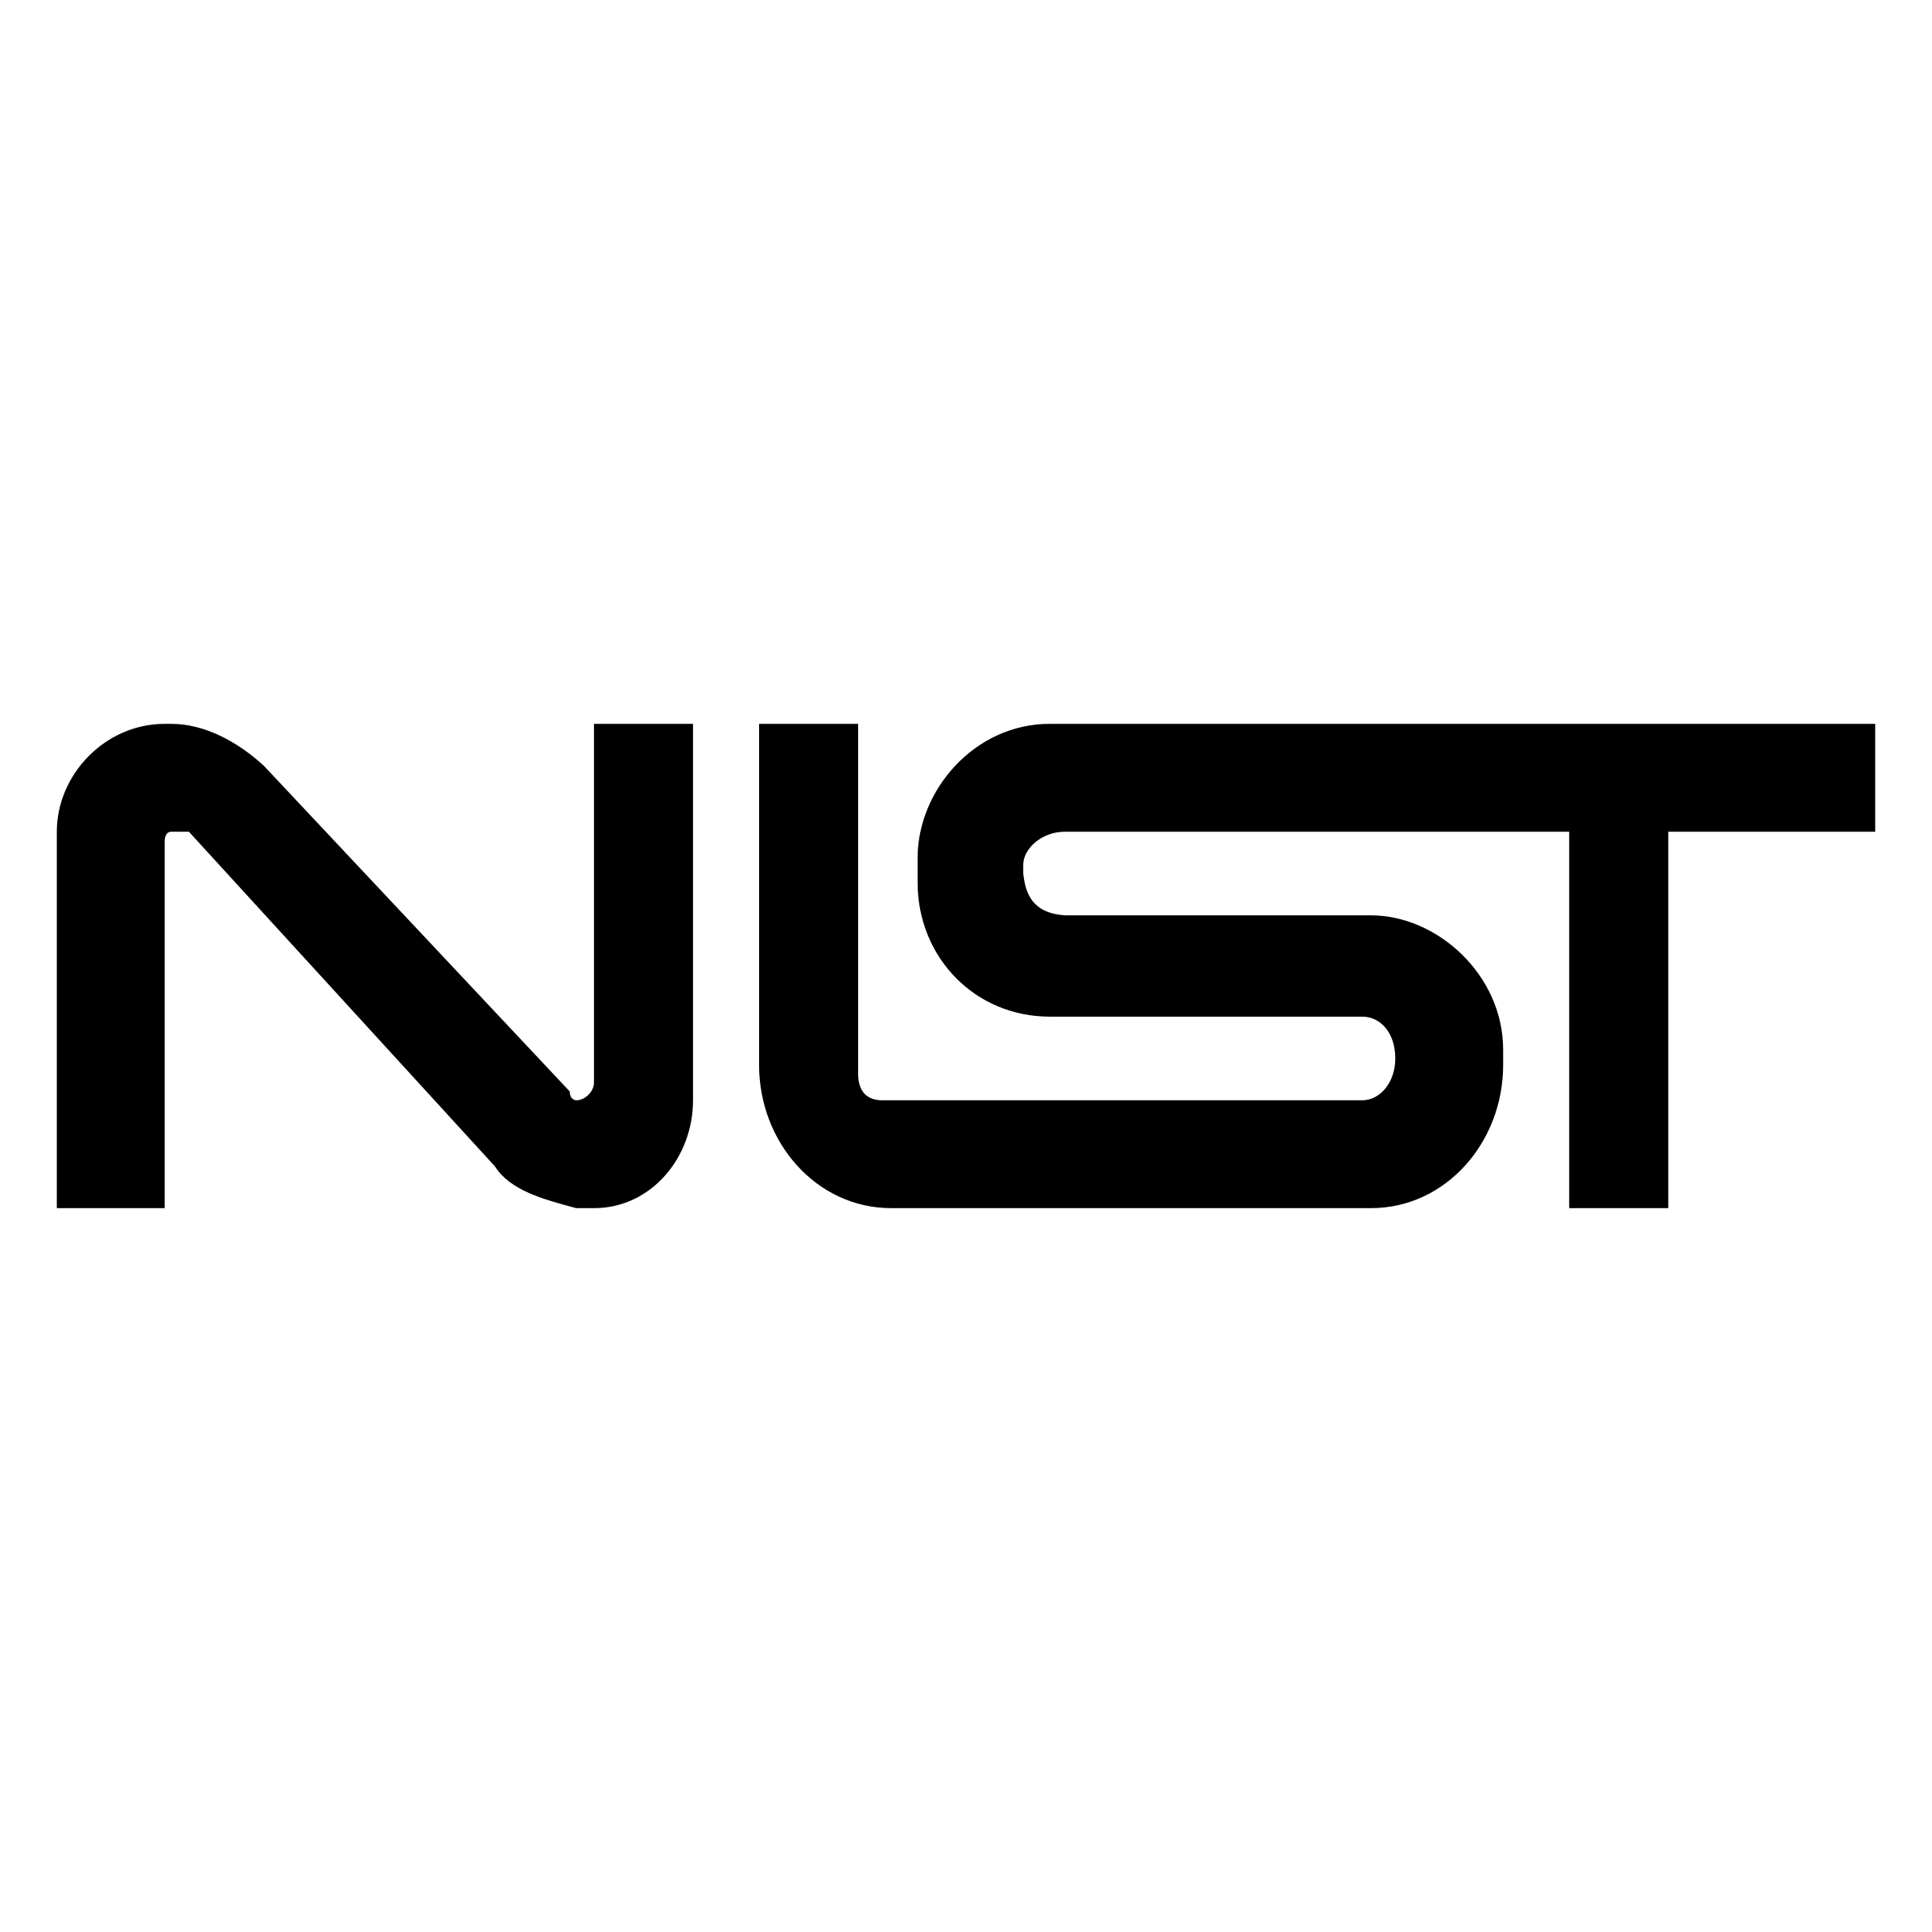 NIST cyber Framework